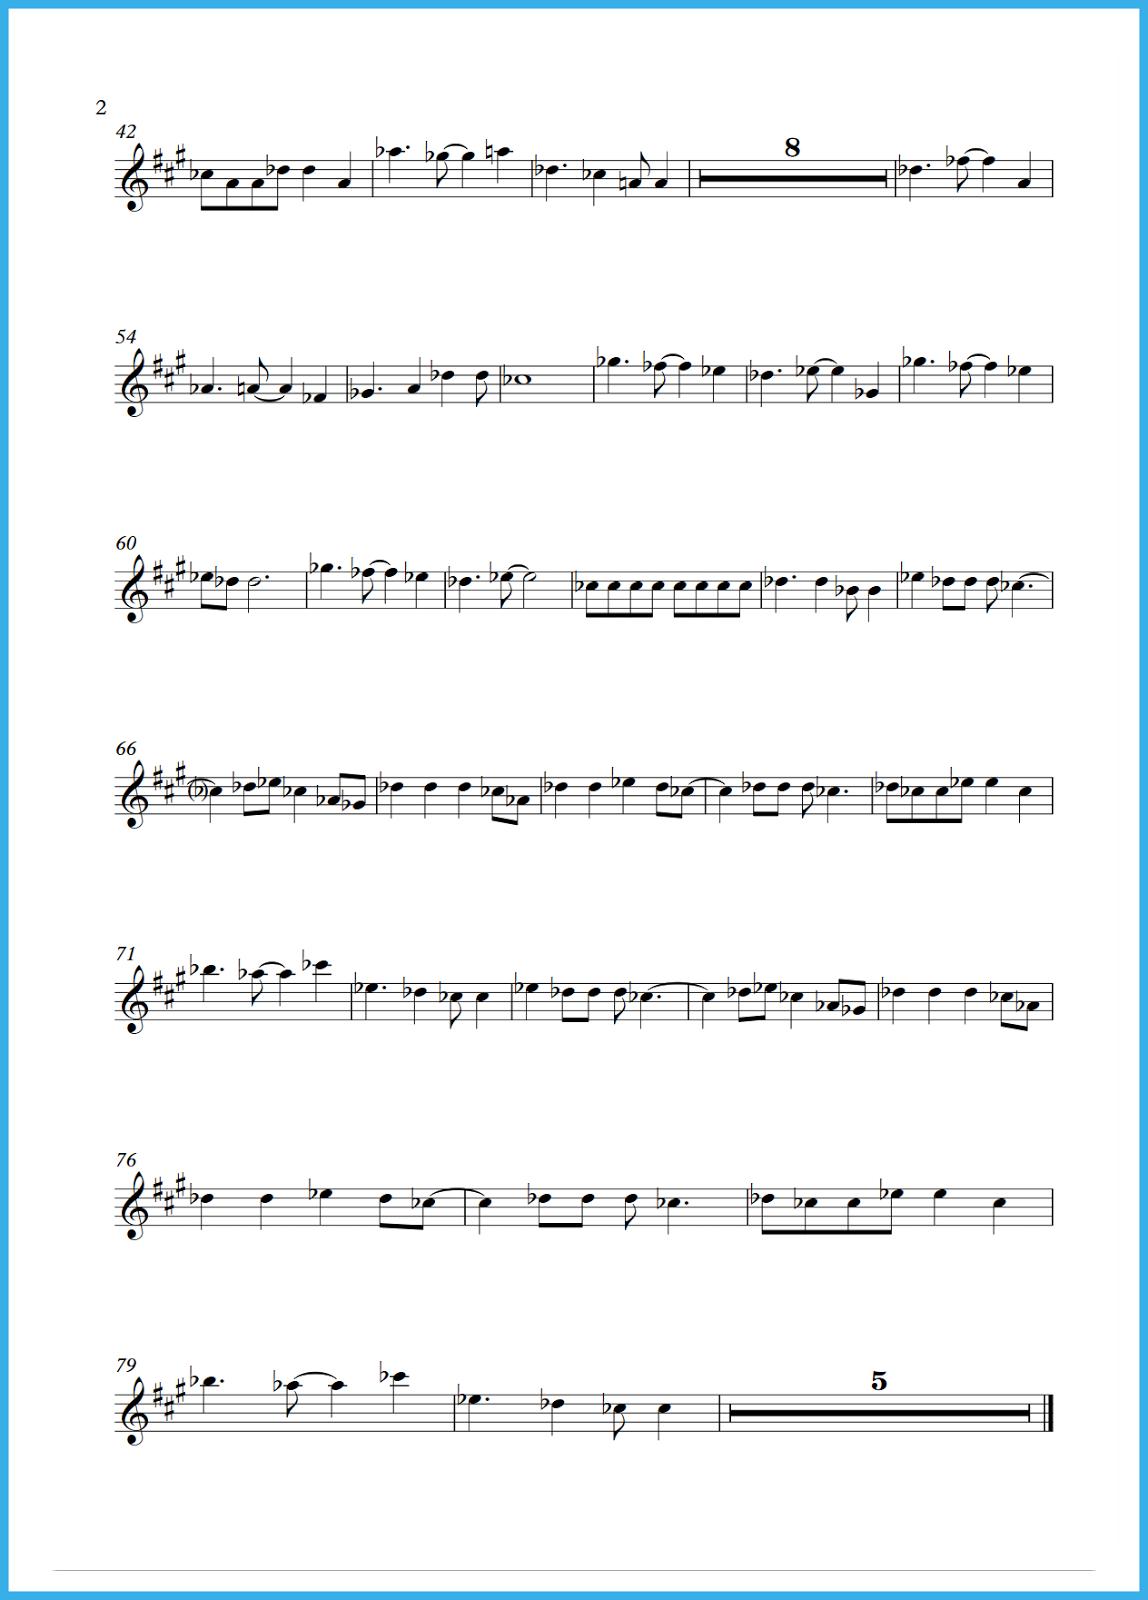 http://1.bp.blogspot.com/-6Q-oc3UIjoc/USw9qoZT9iI/AAAAAAAADUA/YRCBEnEC3TE/s1600/Lucky+-+Britney+Spears+-+sheet+for+alto+sax,+trumpet,+clarinet+-+partitura+saxo+alto,+trompeta,+clarinete_0002.png